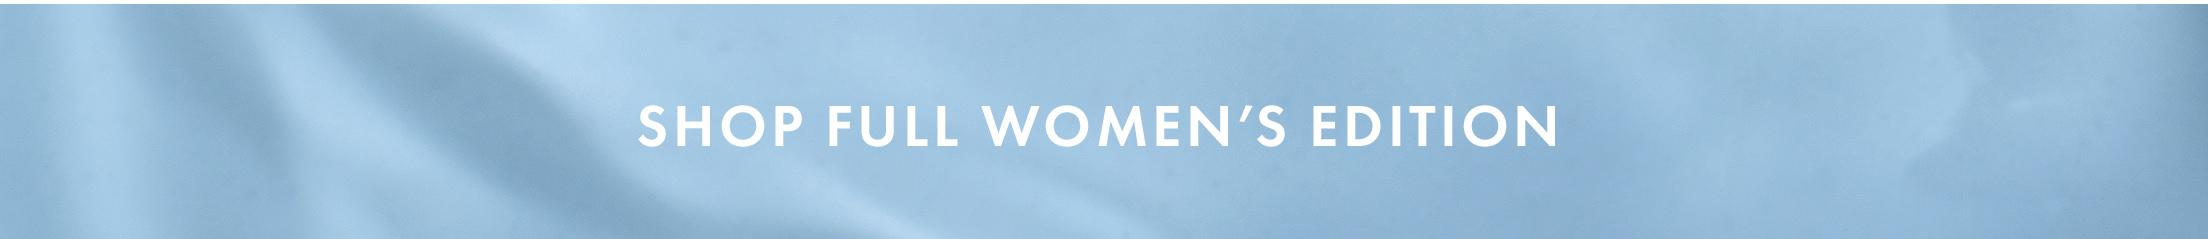 Shop Full Women's Edition